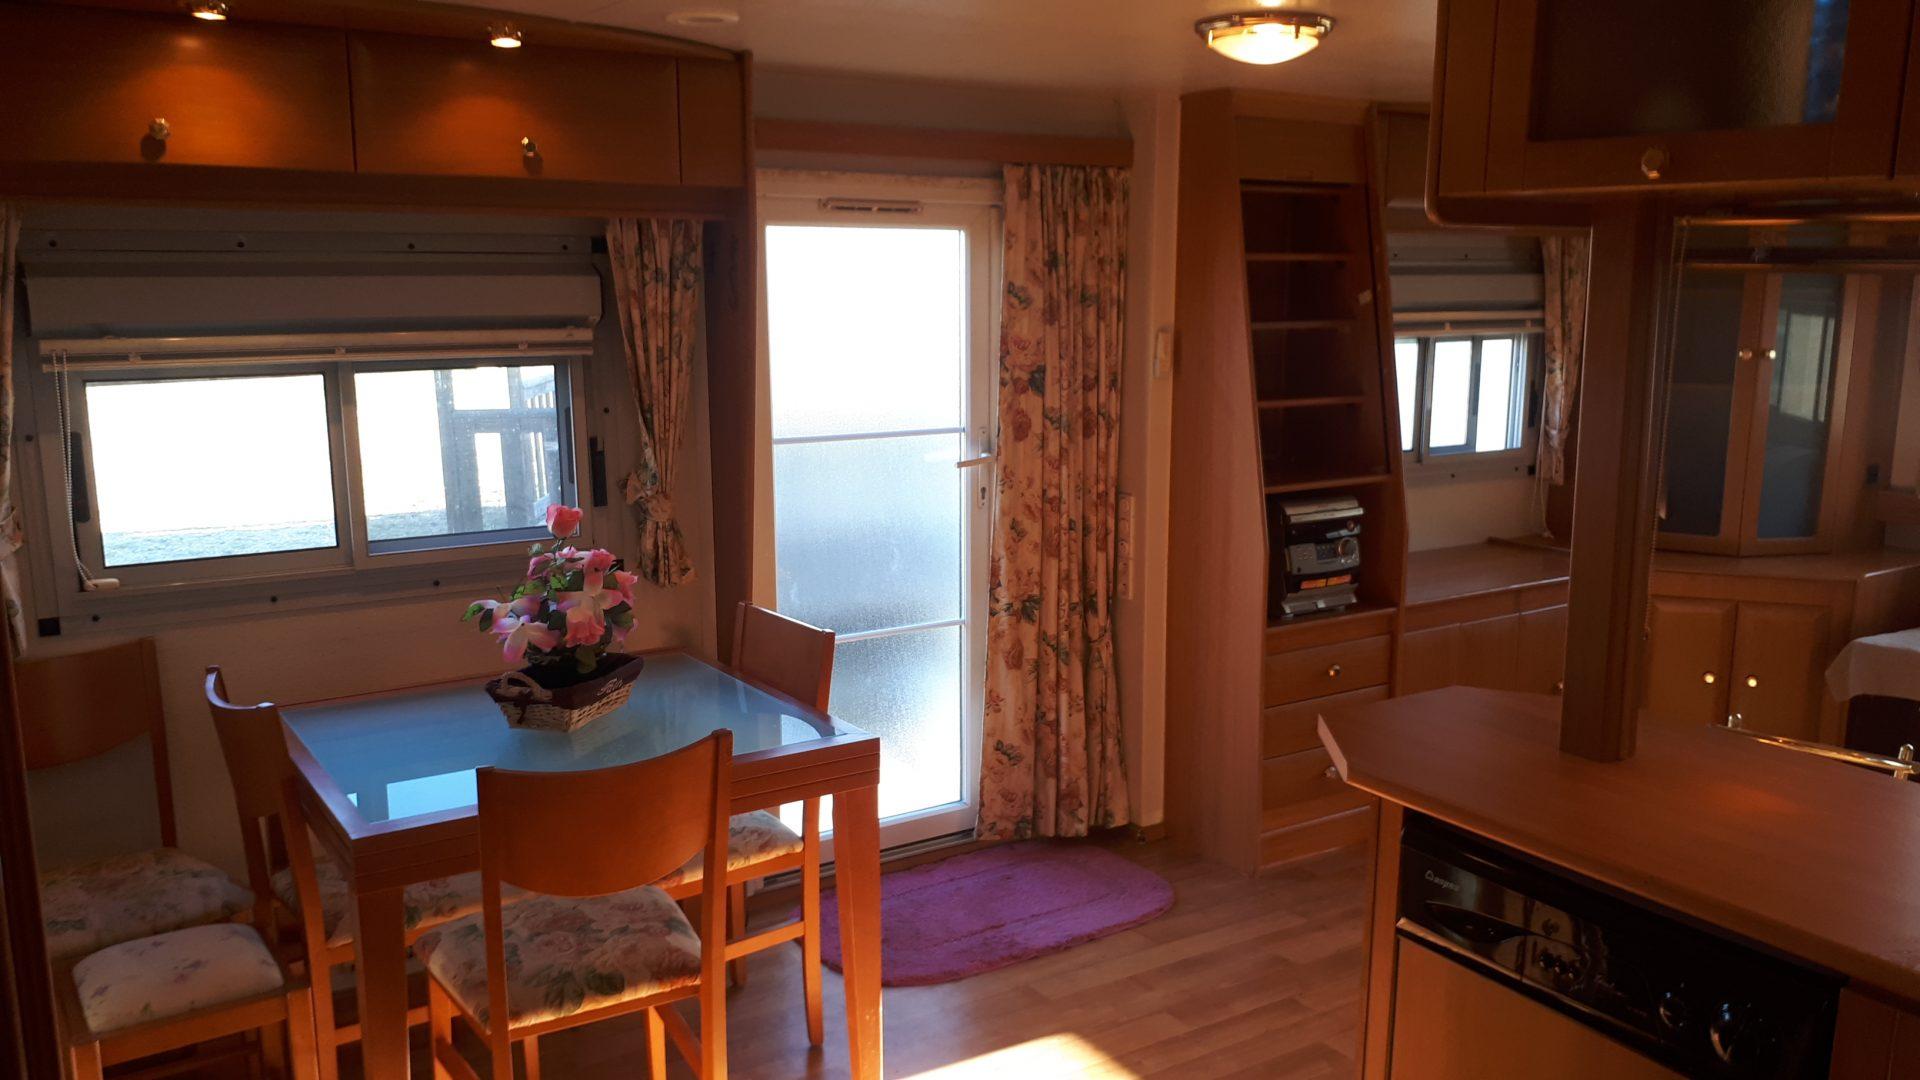 Mobil-home 4 saisons – panoramique – 11x4m – 2 chambres